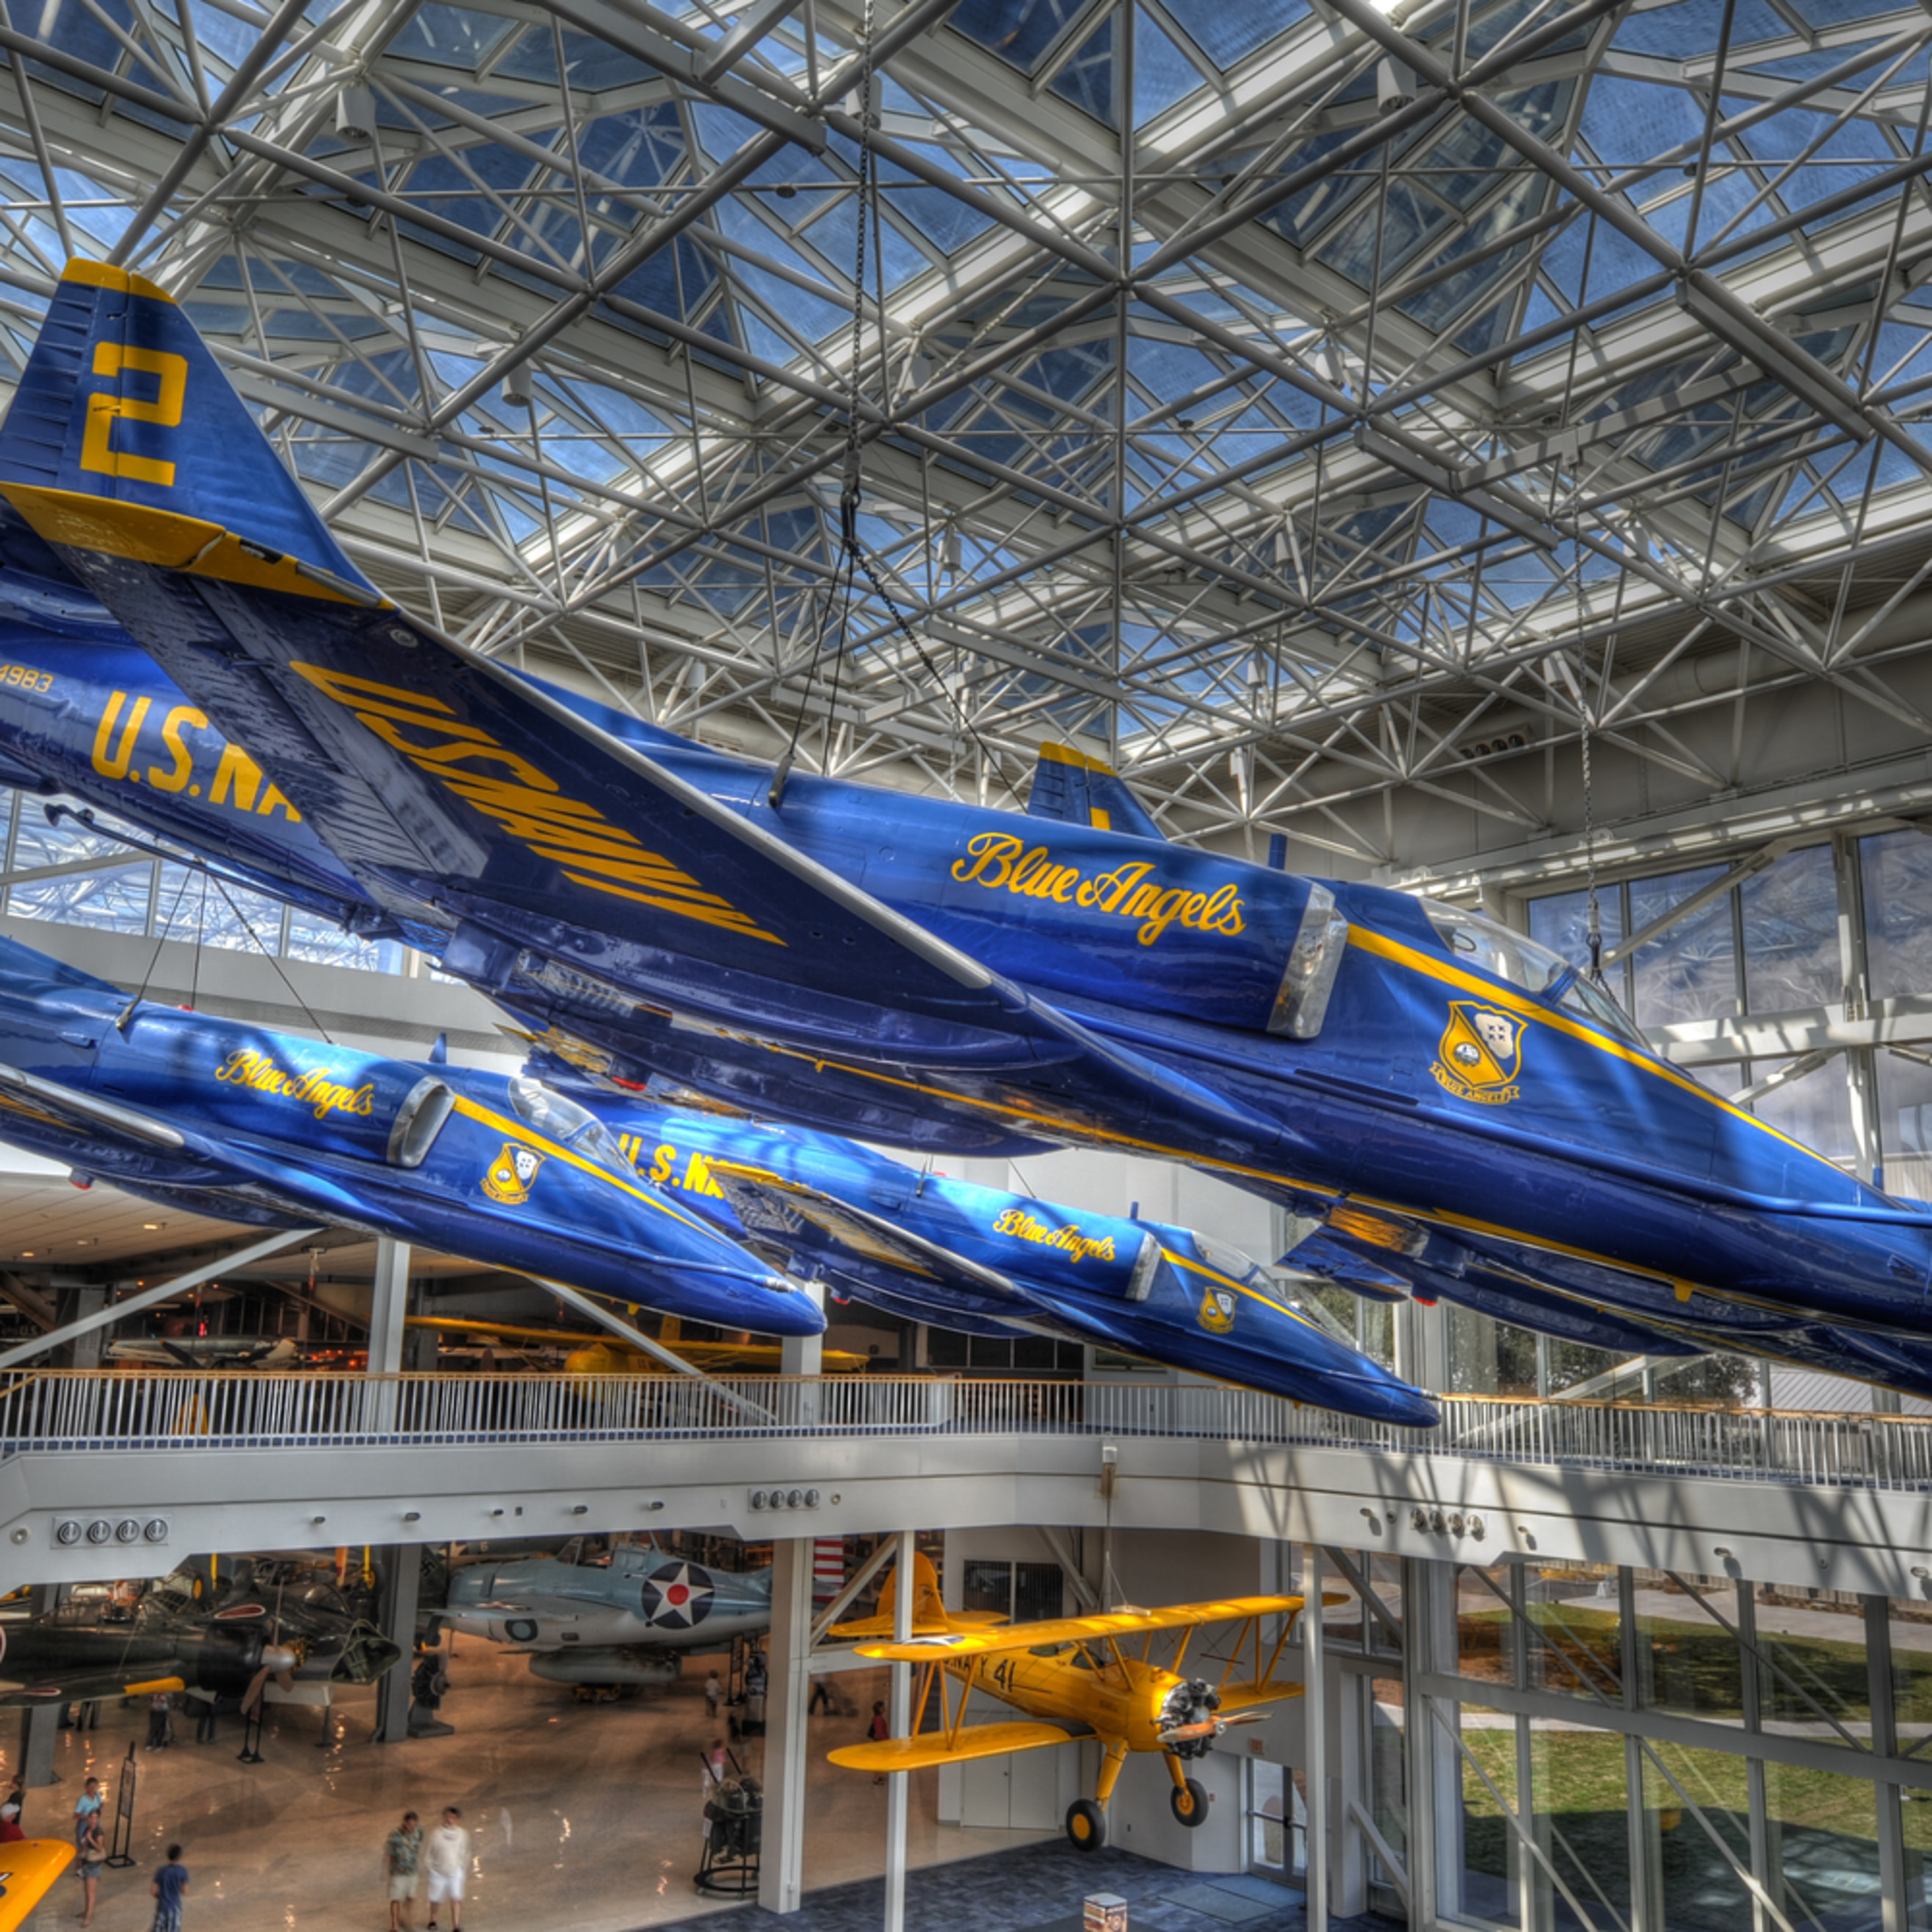 1104 naval aviation museum 0398 400 402 403 406 dduvgy